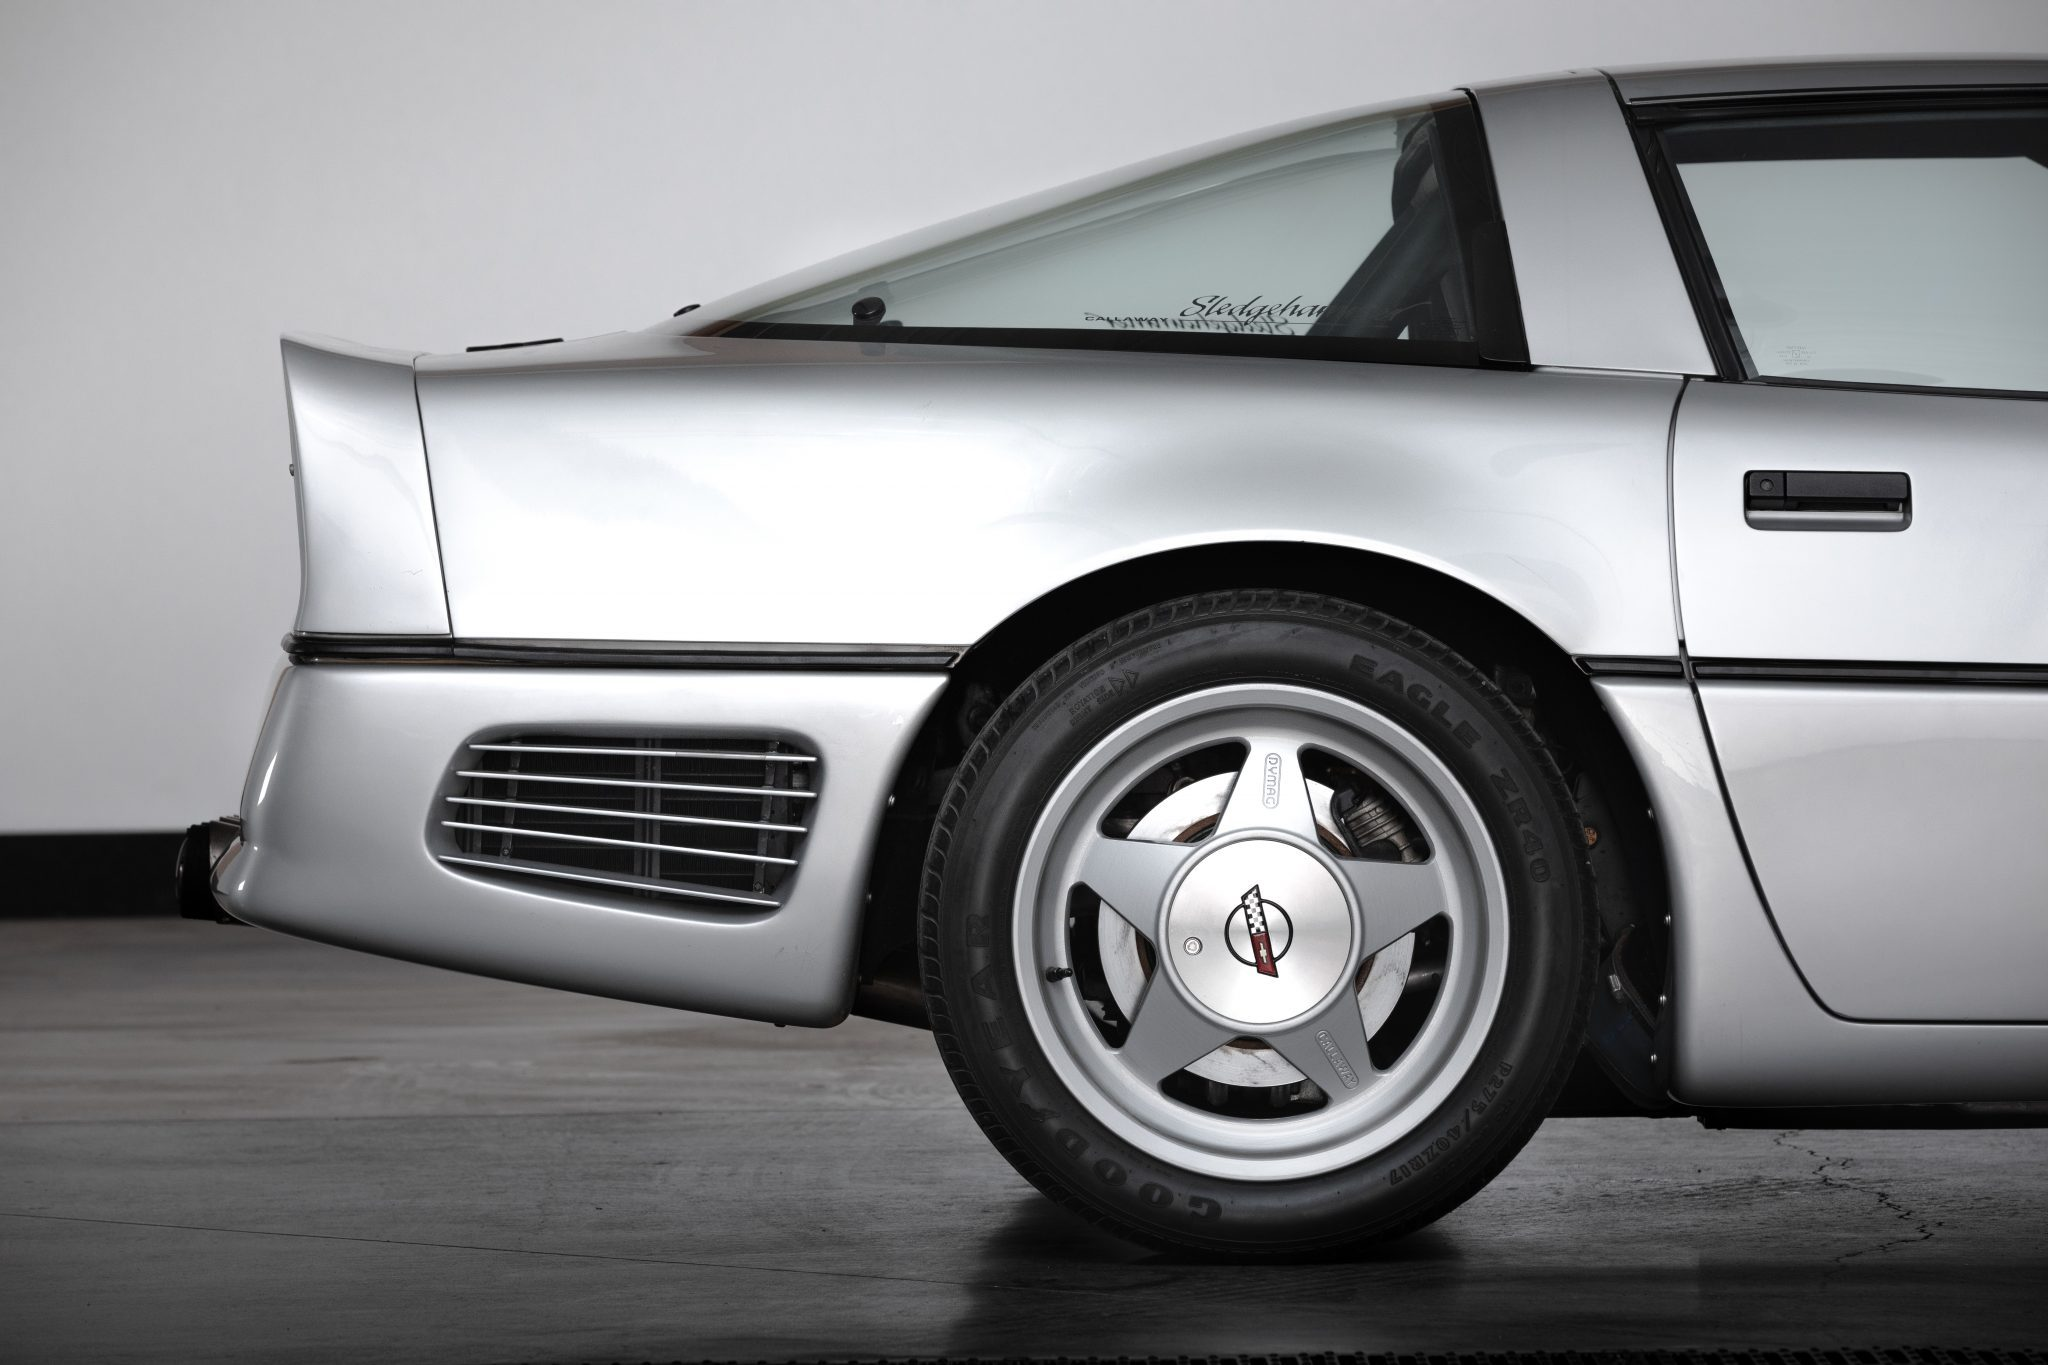 1988 Chevrolet Corvette Callaway SledgeHammer BaT rear profile